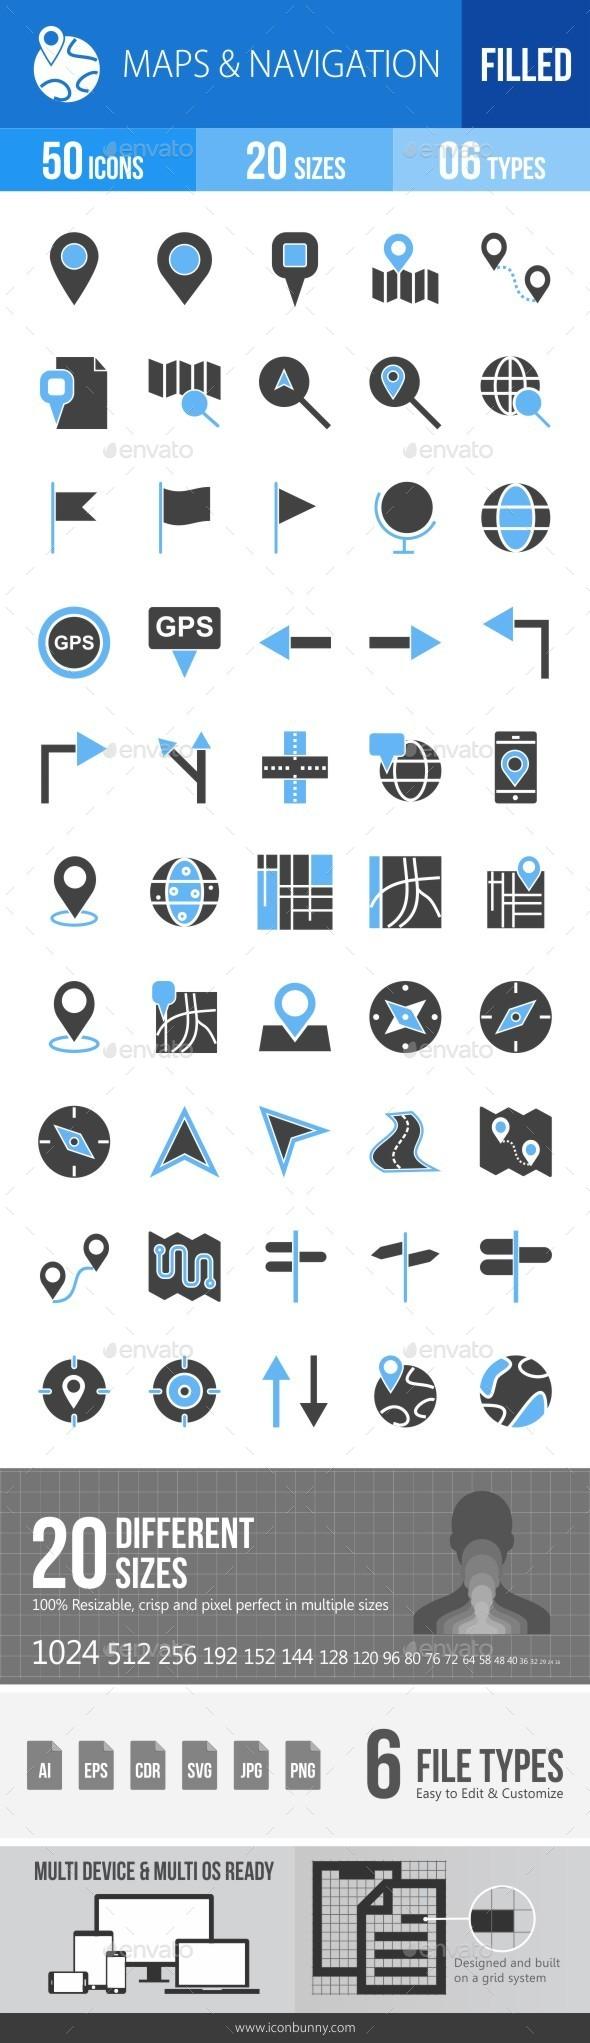 Maps & Navigation Blue & Black Icons - Icons